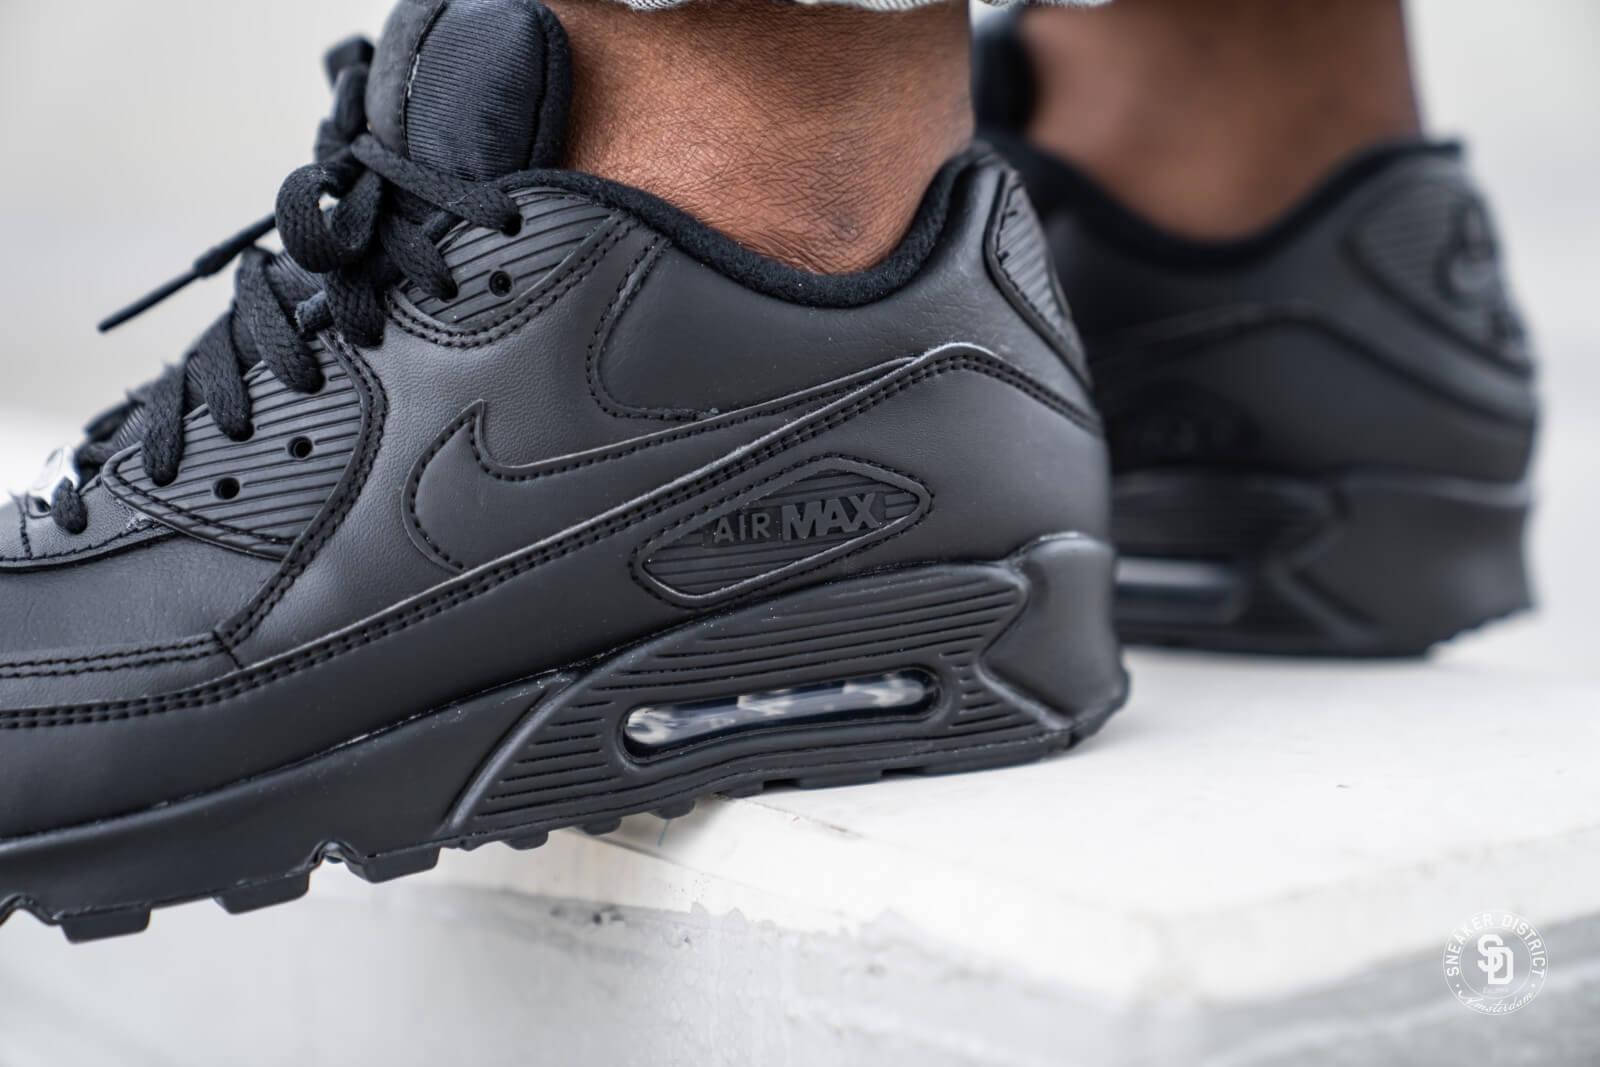 Nike Air Max 90 Leather Black/Black